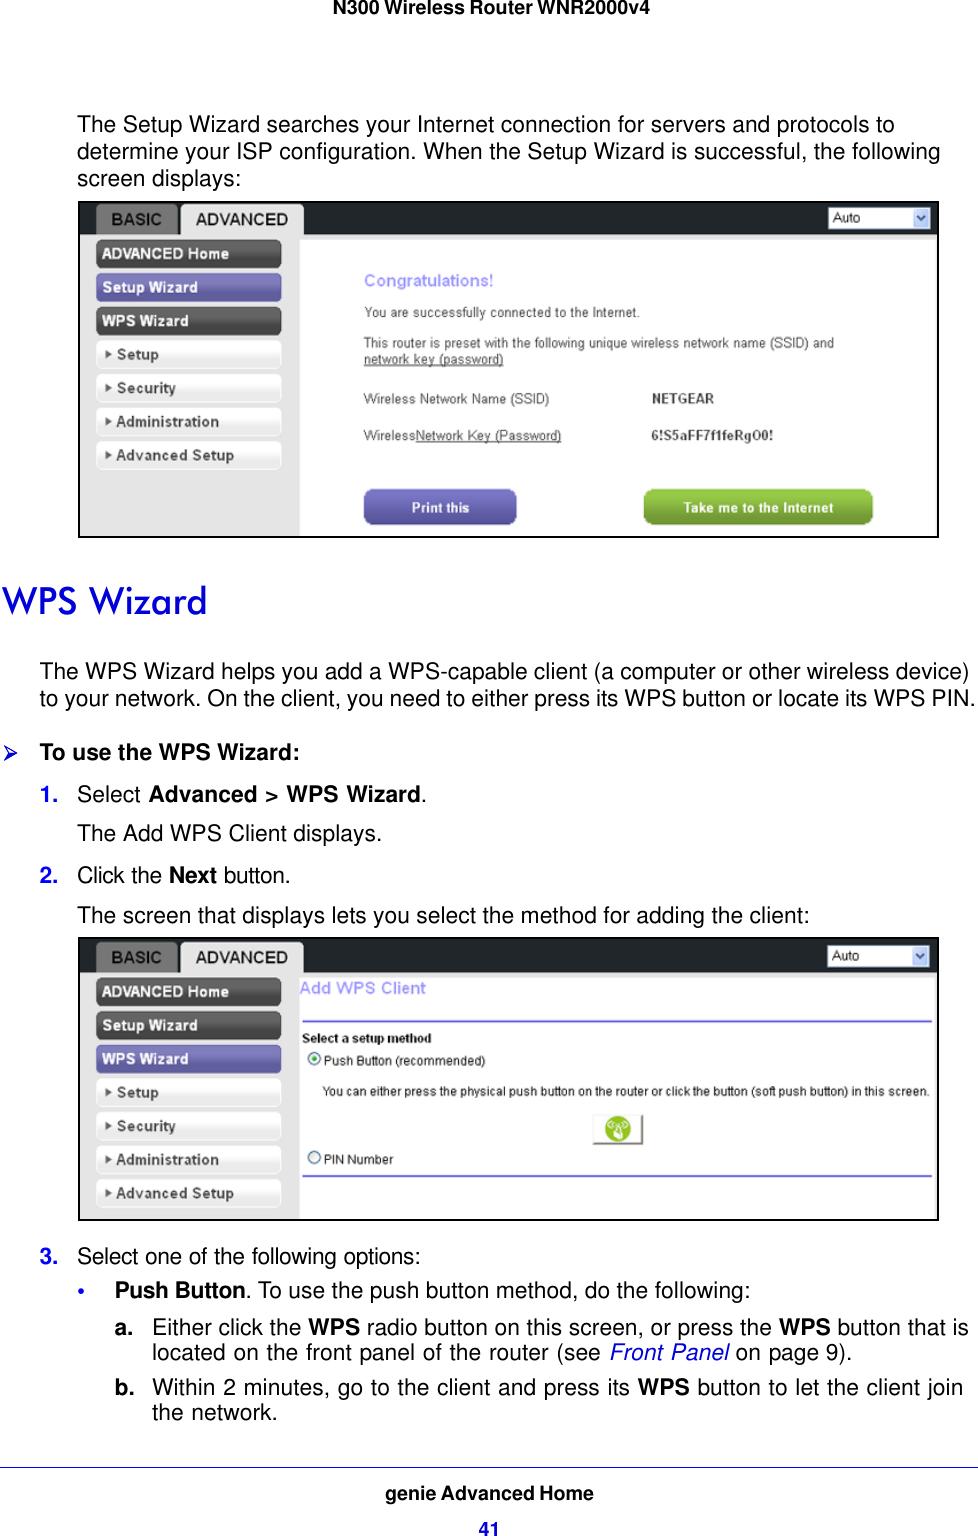 N300 Wireless Router WNR2000v4 User Manual Netgear WNR 2000v4